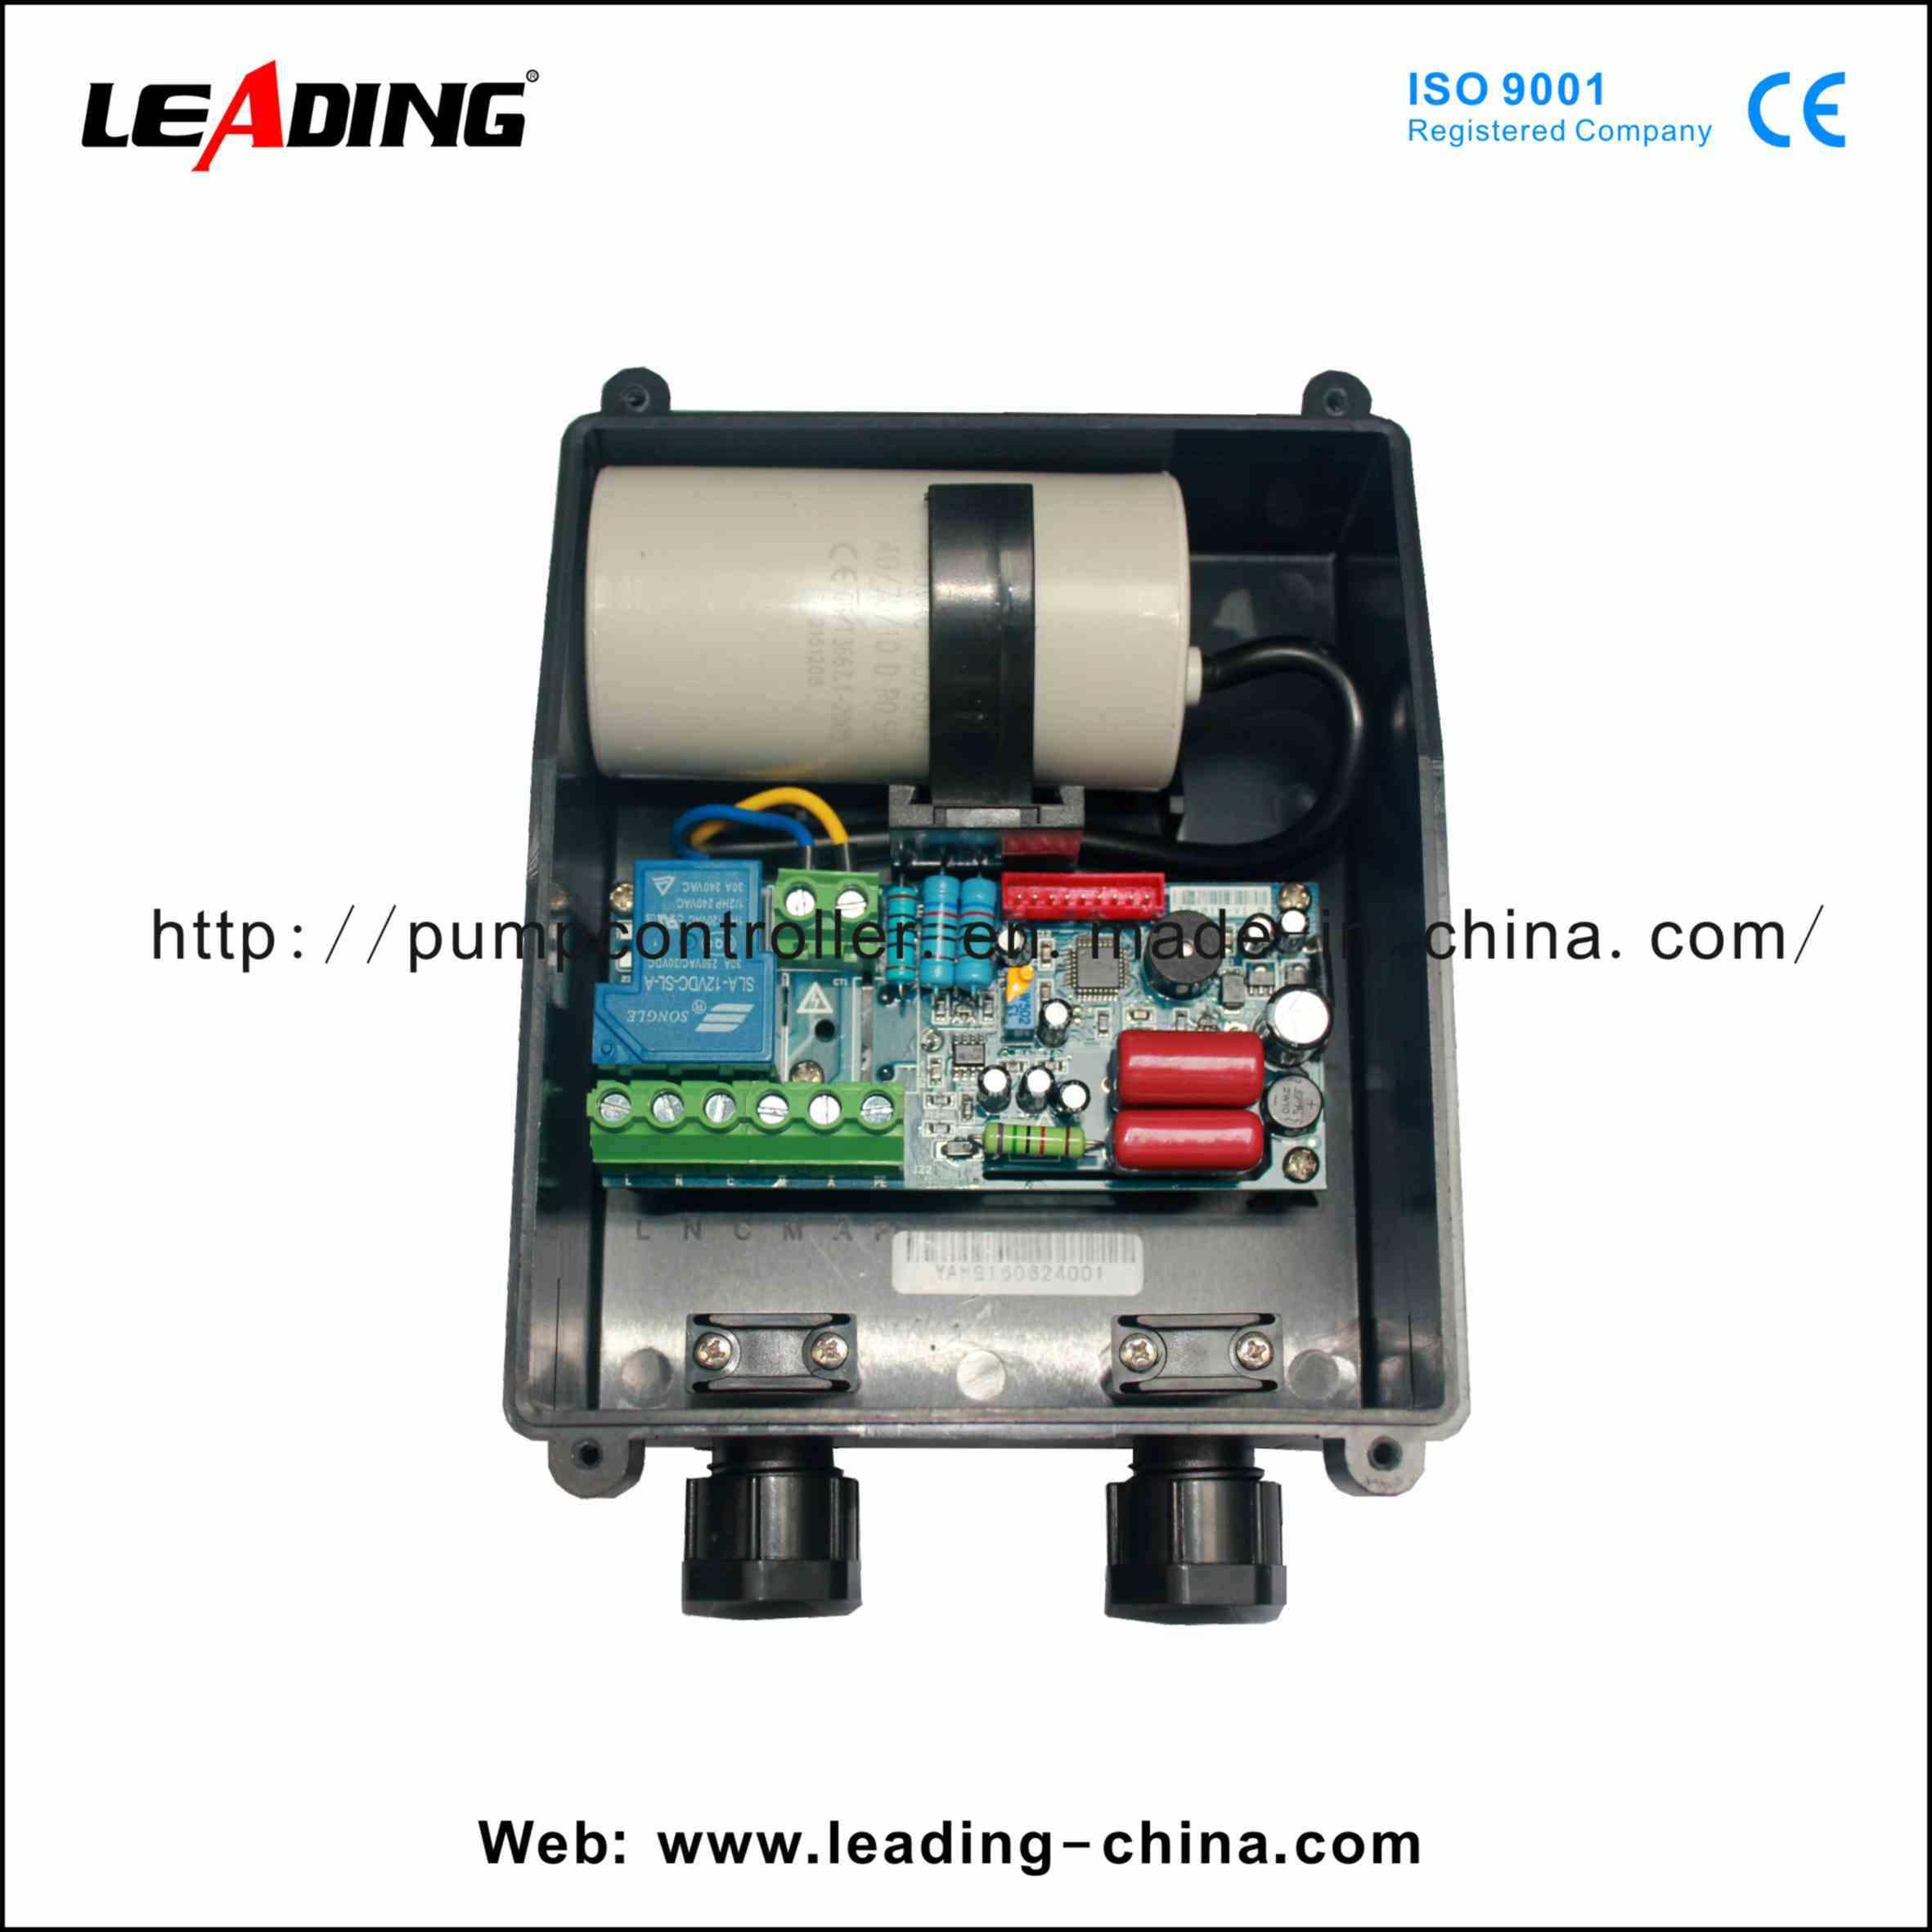 China AC Power Supply of Single Phase Motor Starter (MP-S1) Photos